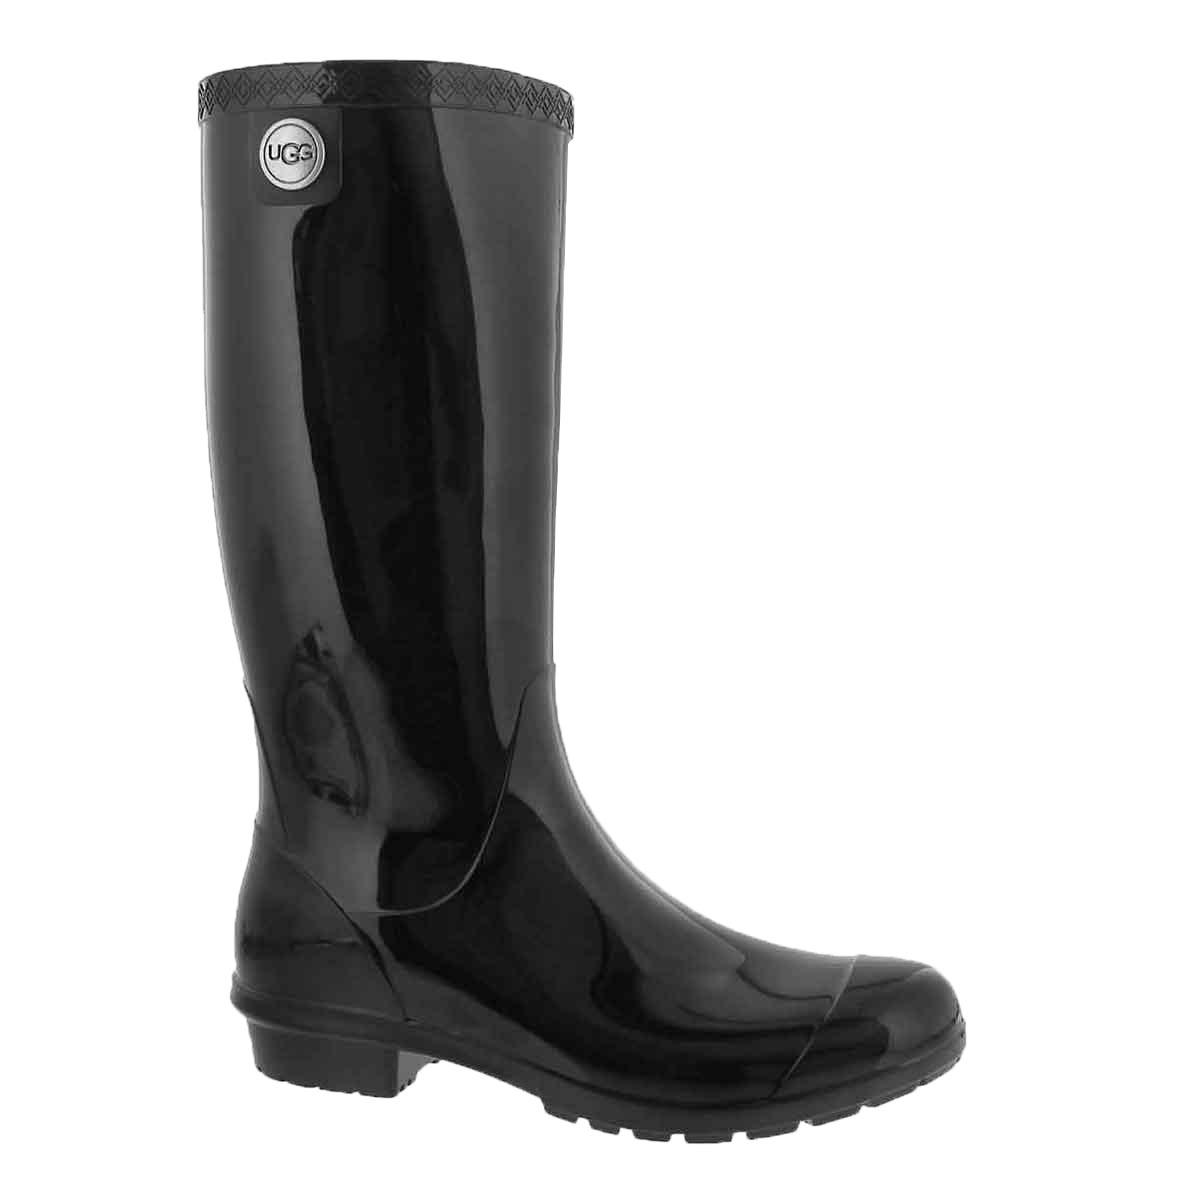 Women's SHAYE black waterproof rain boots